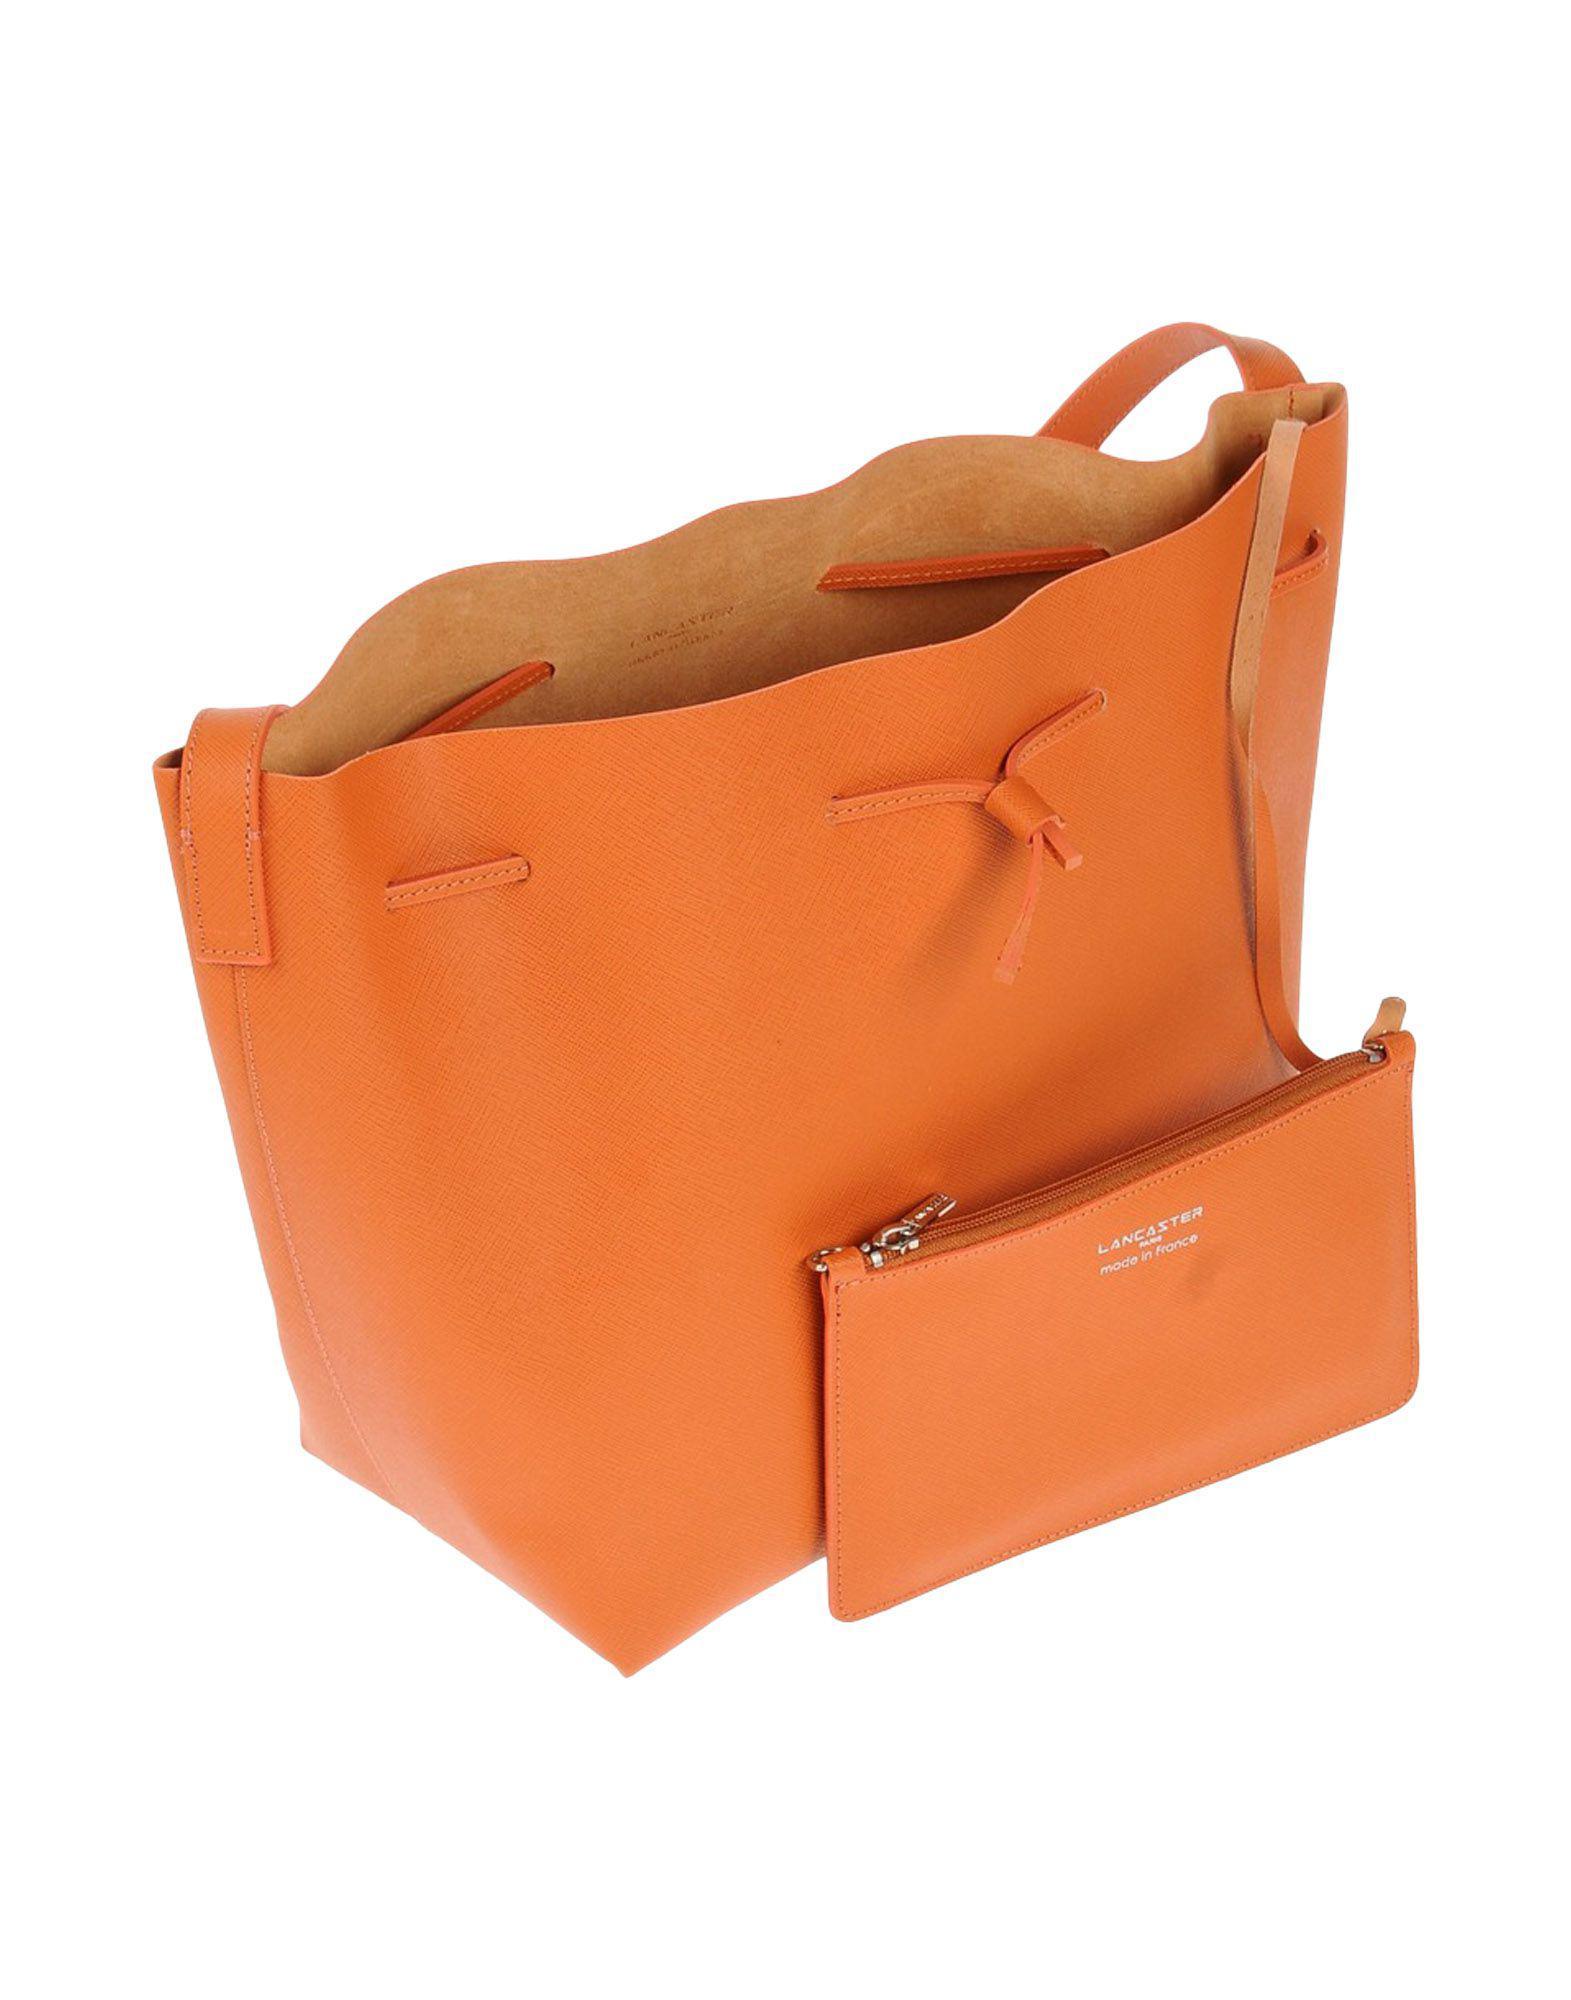 Lancaster Leather Cross-body Bag in Orange